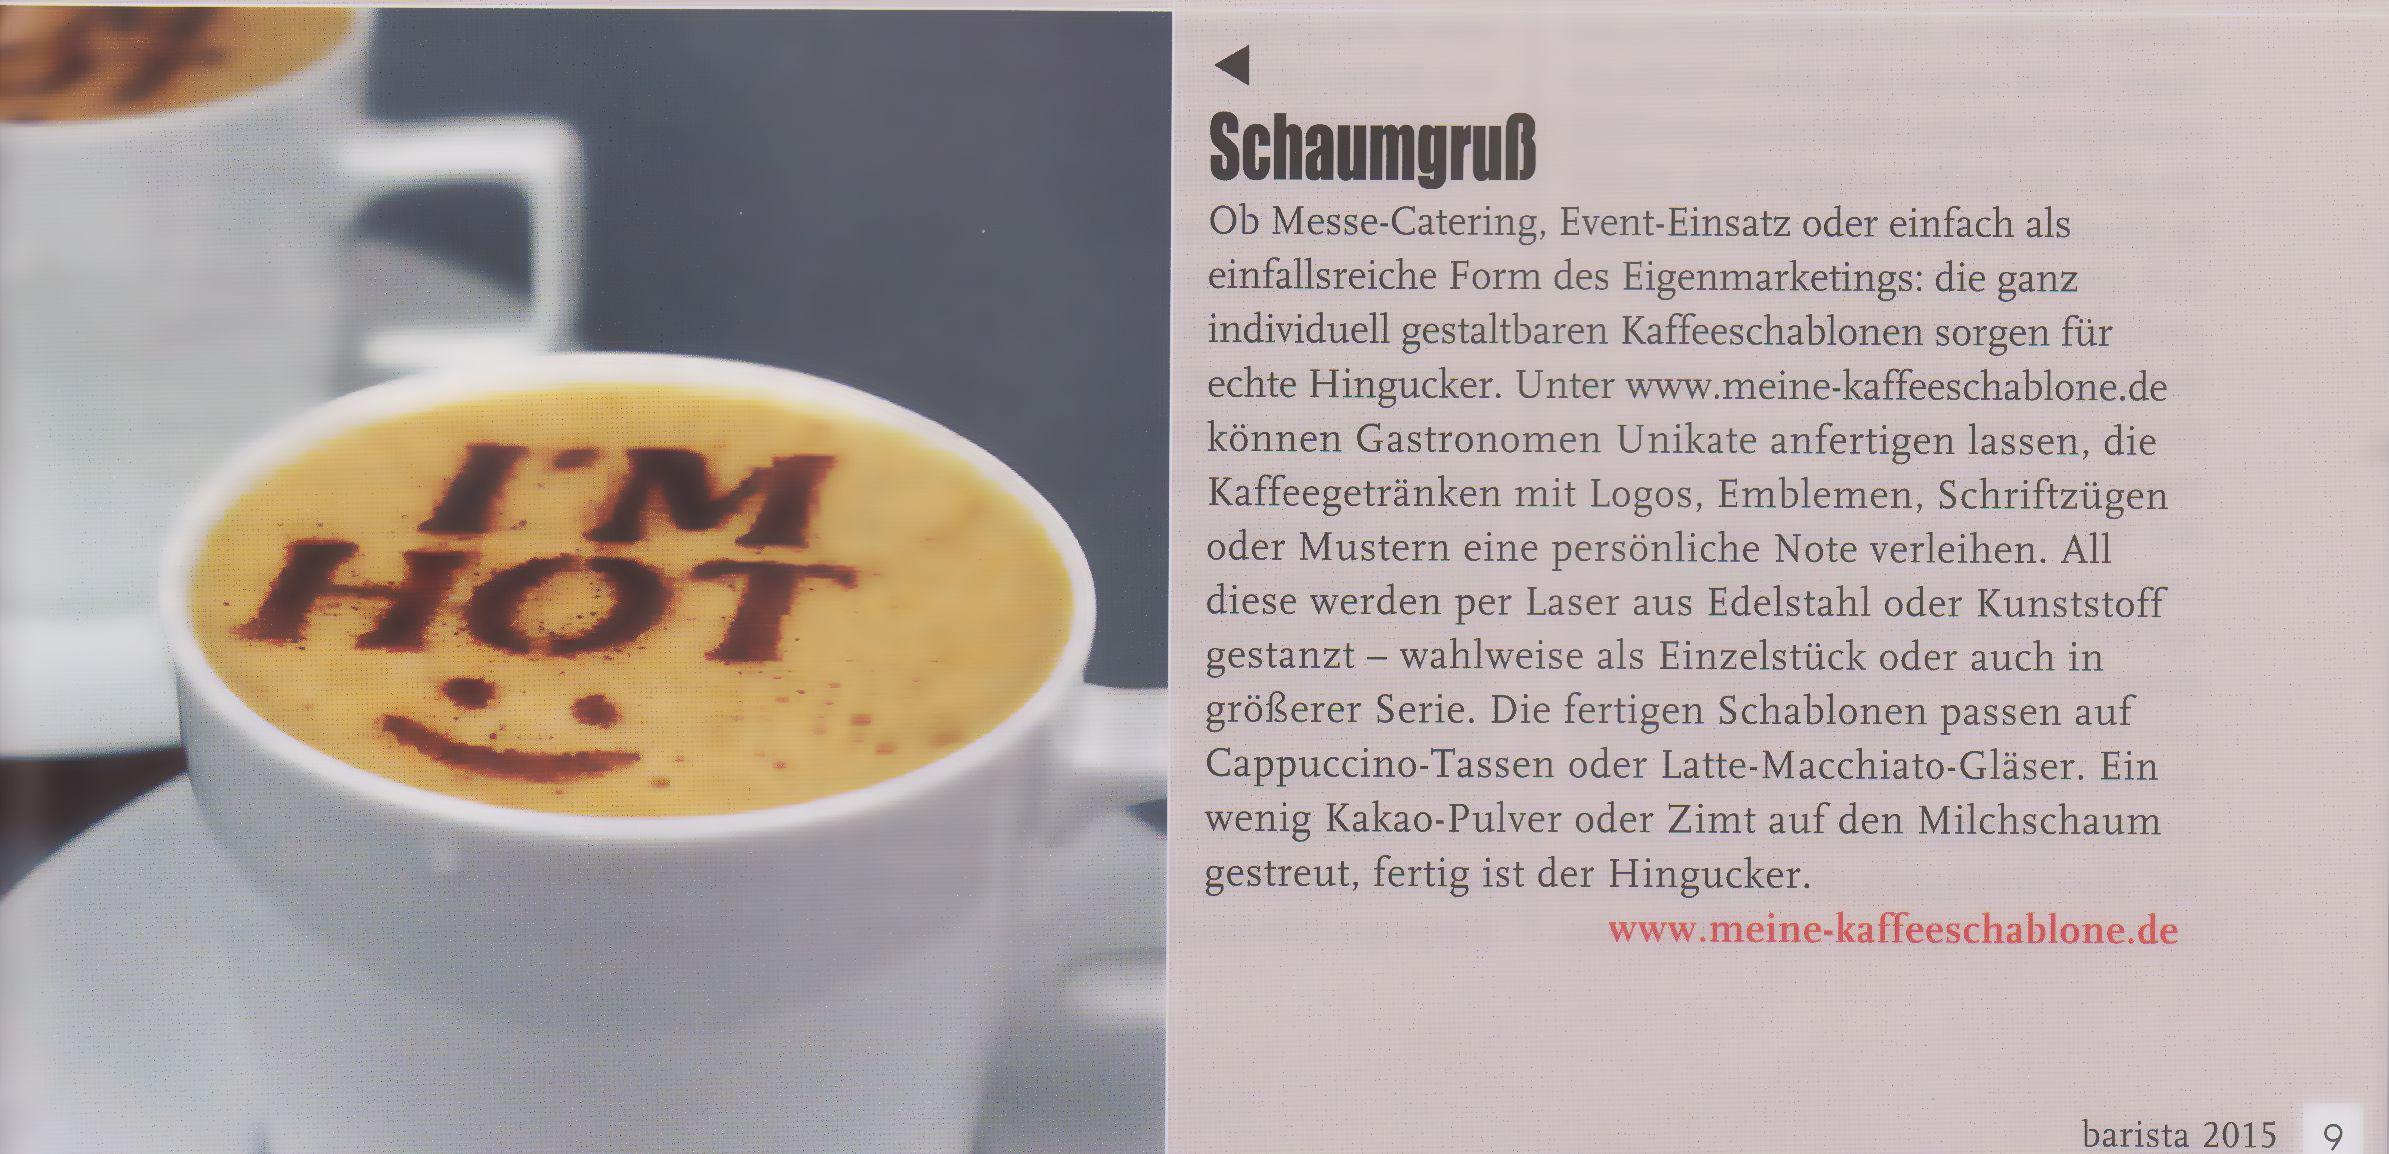 barista - Das Kaffeemagazin